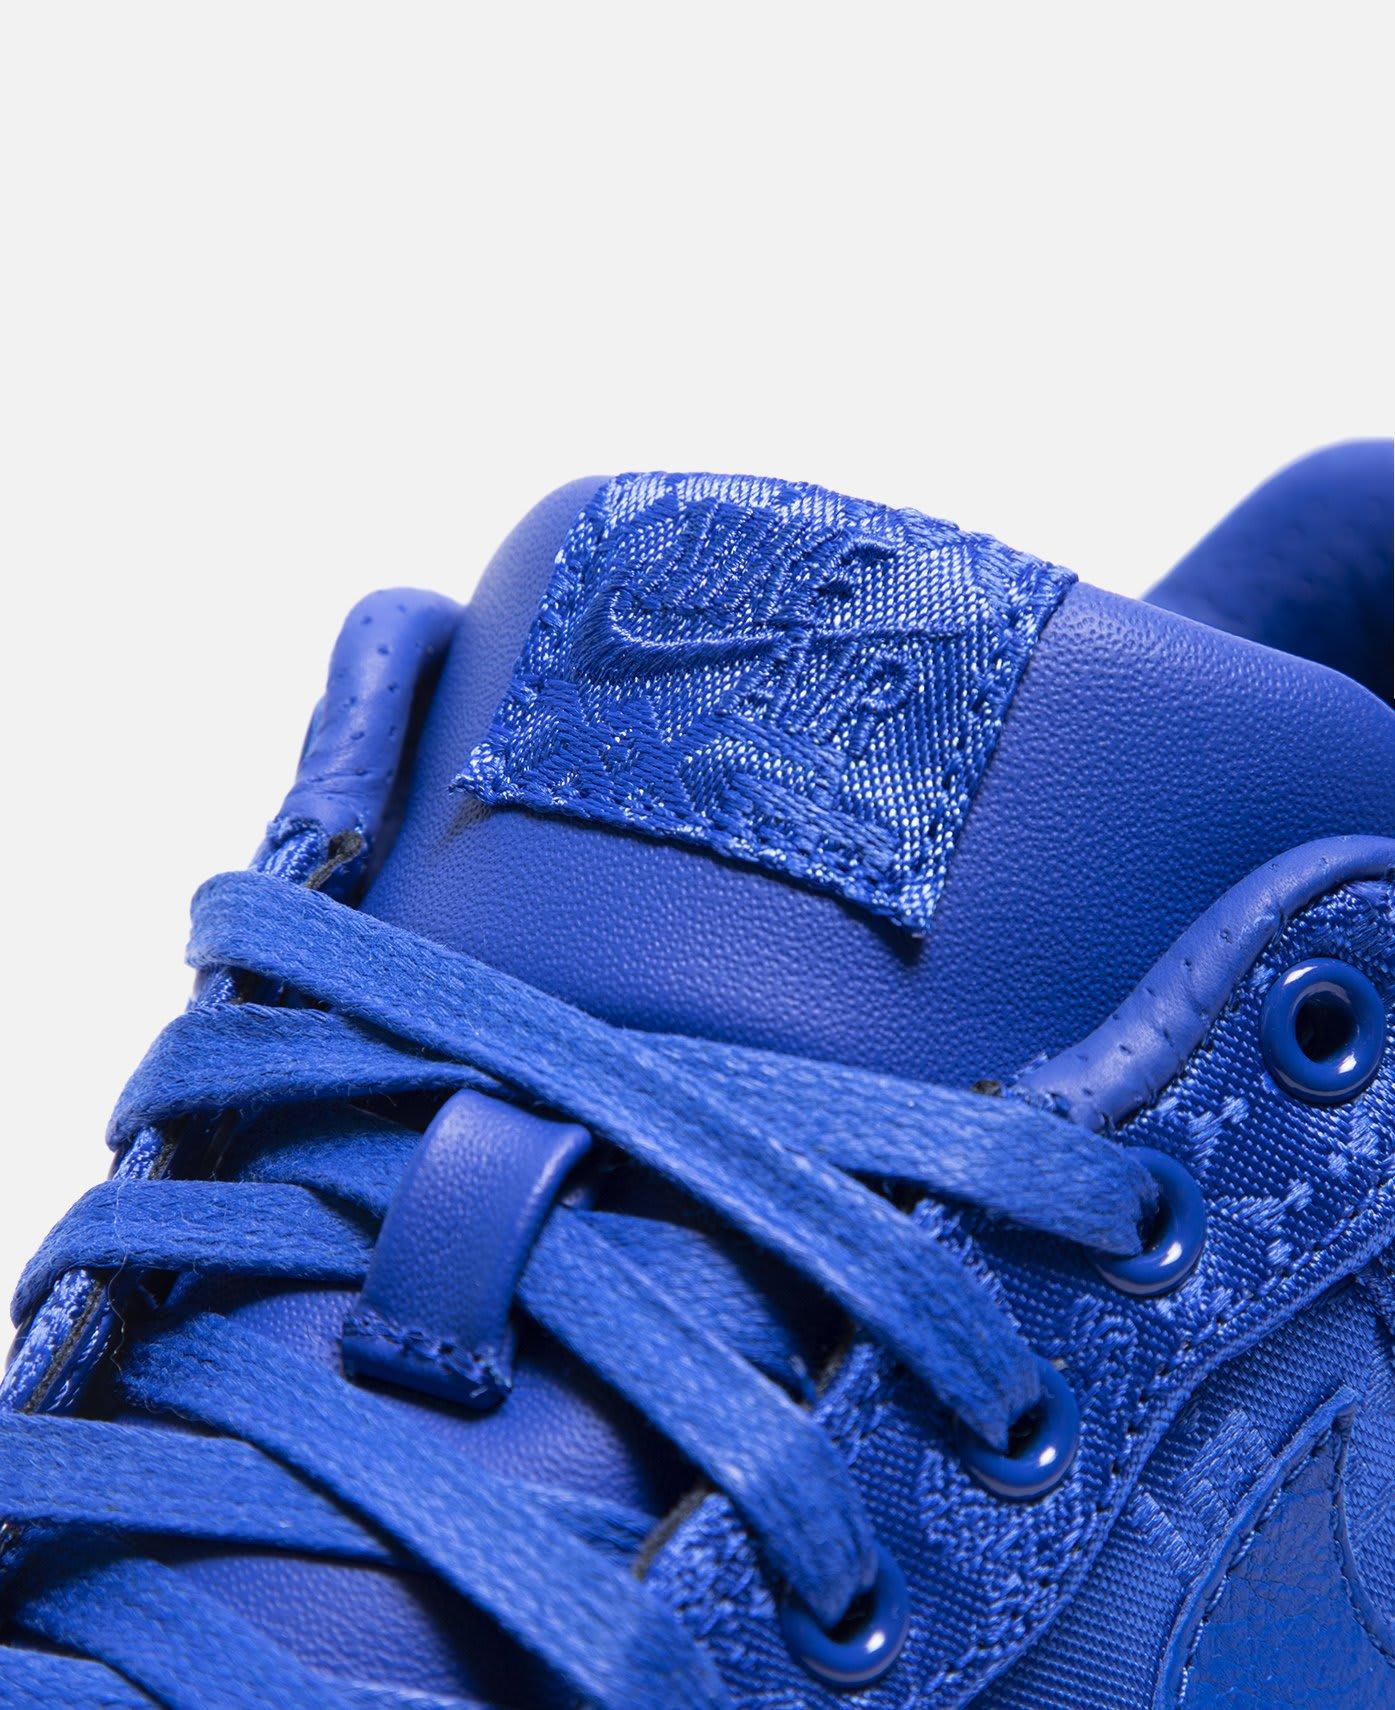 clot-nike-air-force-1-low-royal-university-blue-silk-tongue